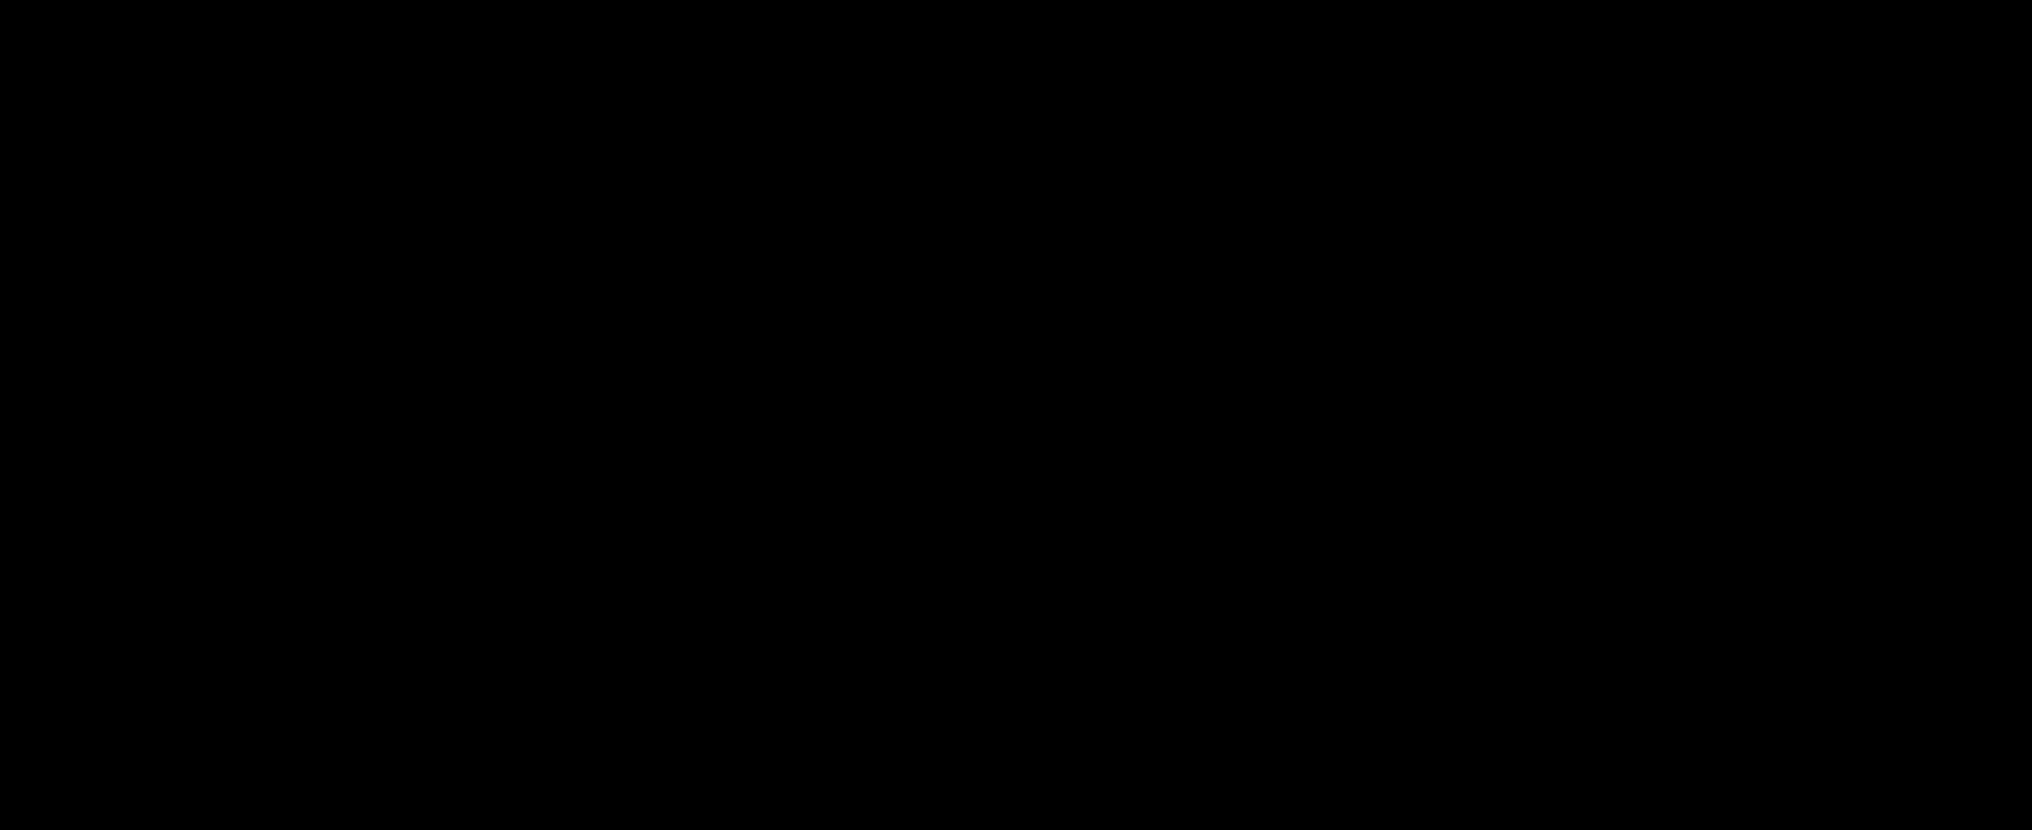 (±)-Carvedilol-d<sub>5</sub>